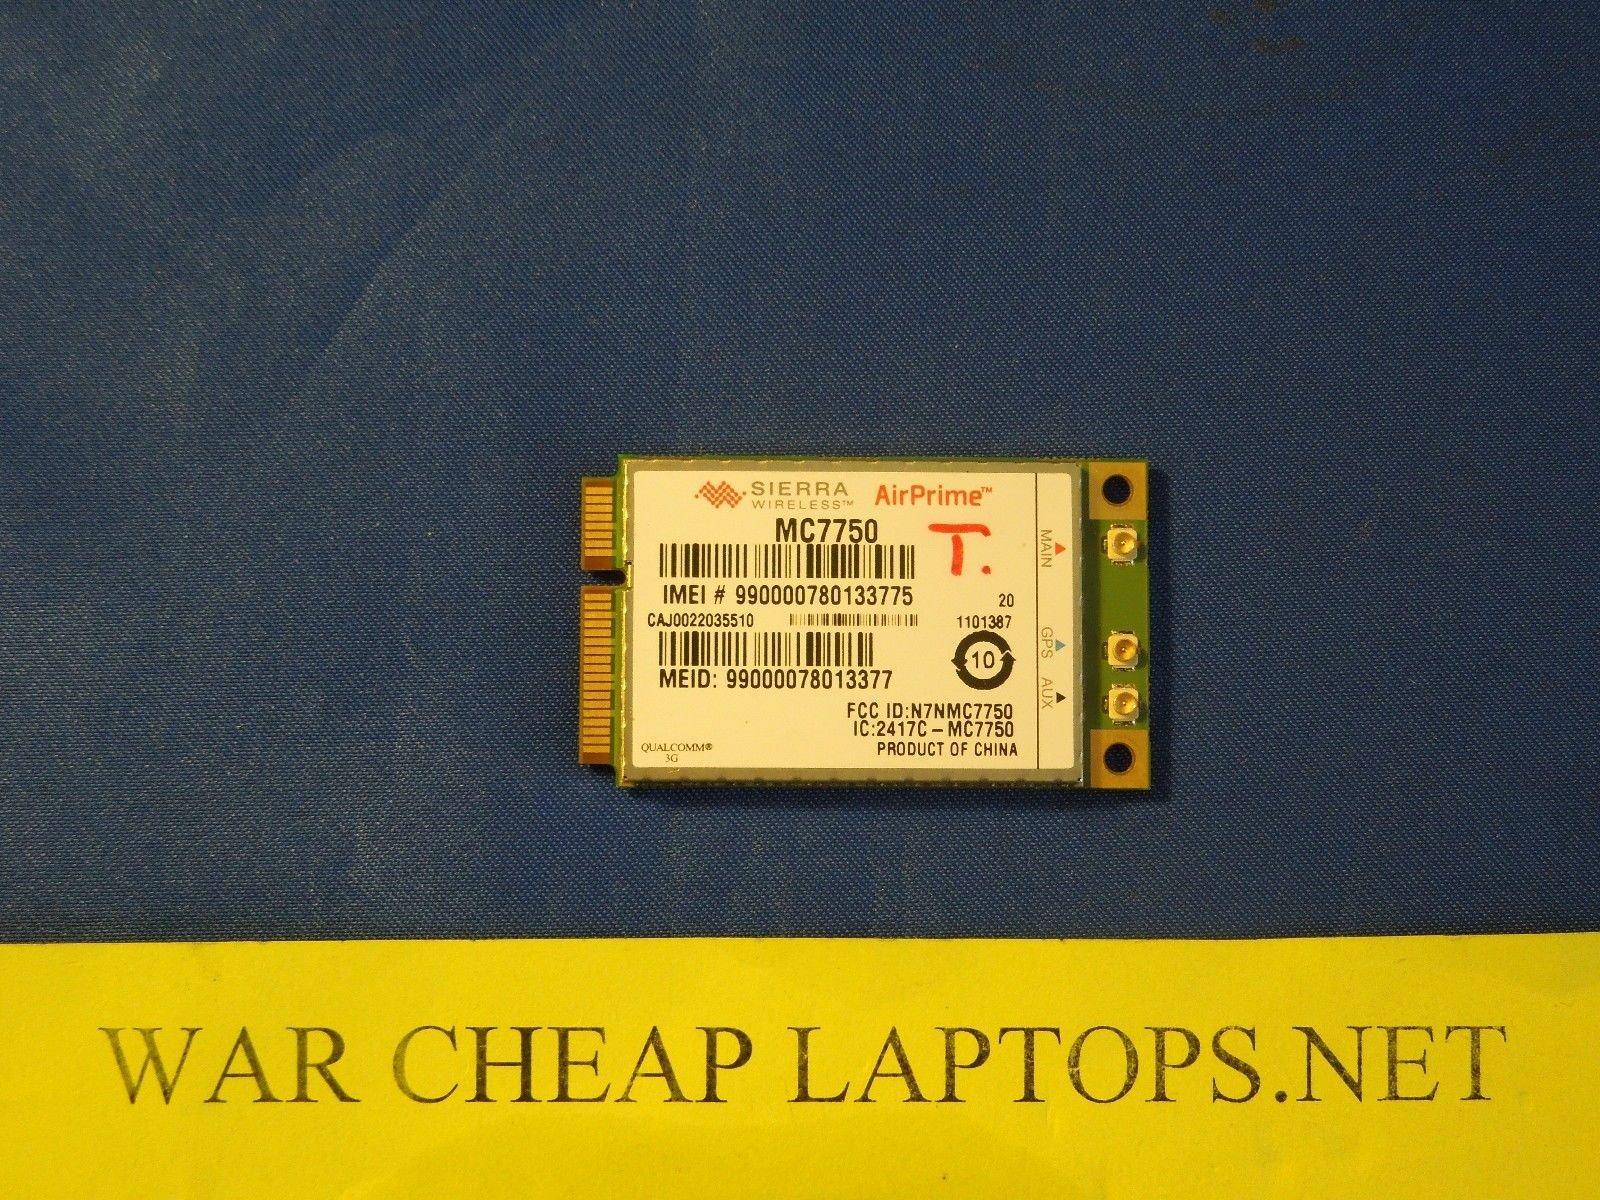 Sierra Airprime MC7750 LTE and Ev-do Module 4g Pci Express Pci-e Card Verizon